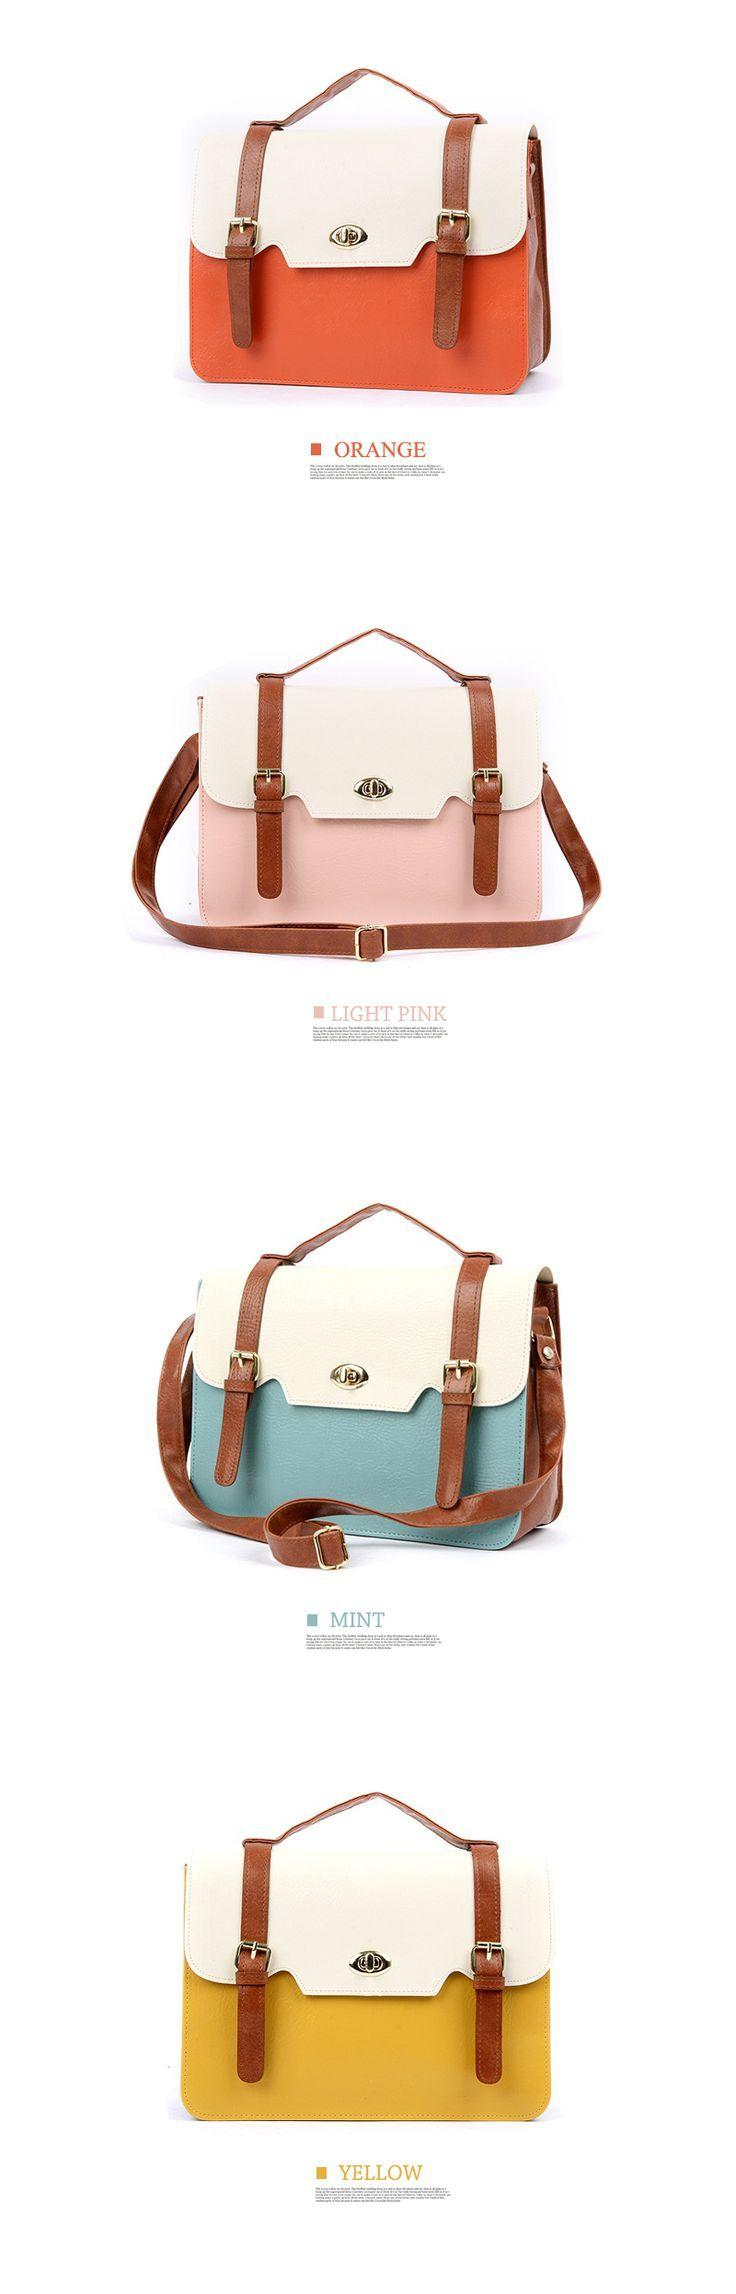 New Women Girl Korea Style Square Handbag Cross Body Shoulder Satchel Bags - best women's handbags, ladies big handbags, buy ladies purse online *sponsored https://www.pinterest.com/purses_handbags/ https://www.pinterest.com/explore/purses/ https://www.pinterest.com/purses_handbags/purses/ https://www.overstock.com/Clothing-Shoes/Handbags/111/dept.html